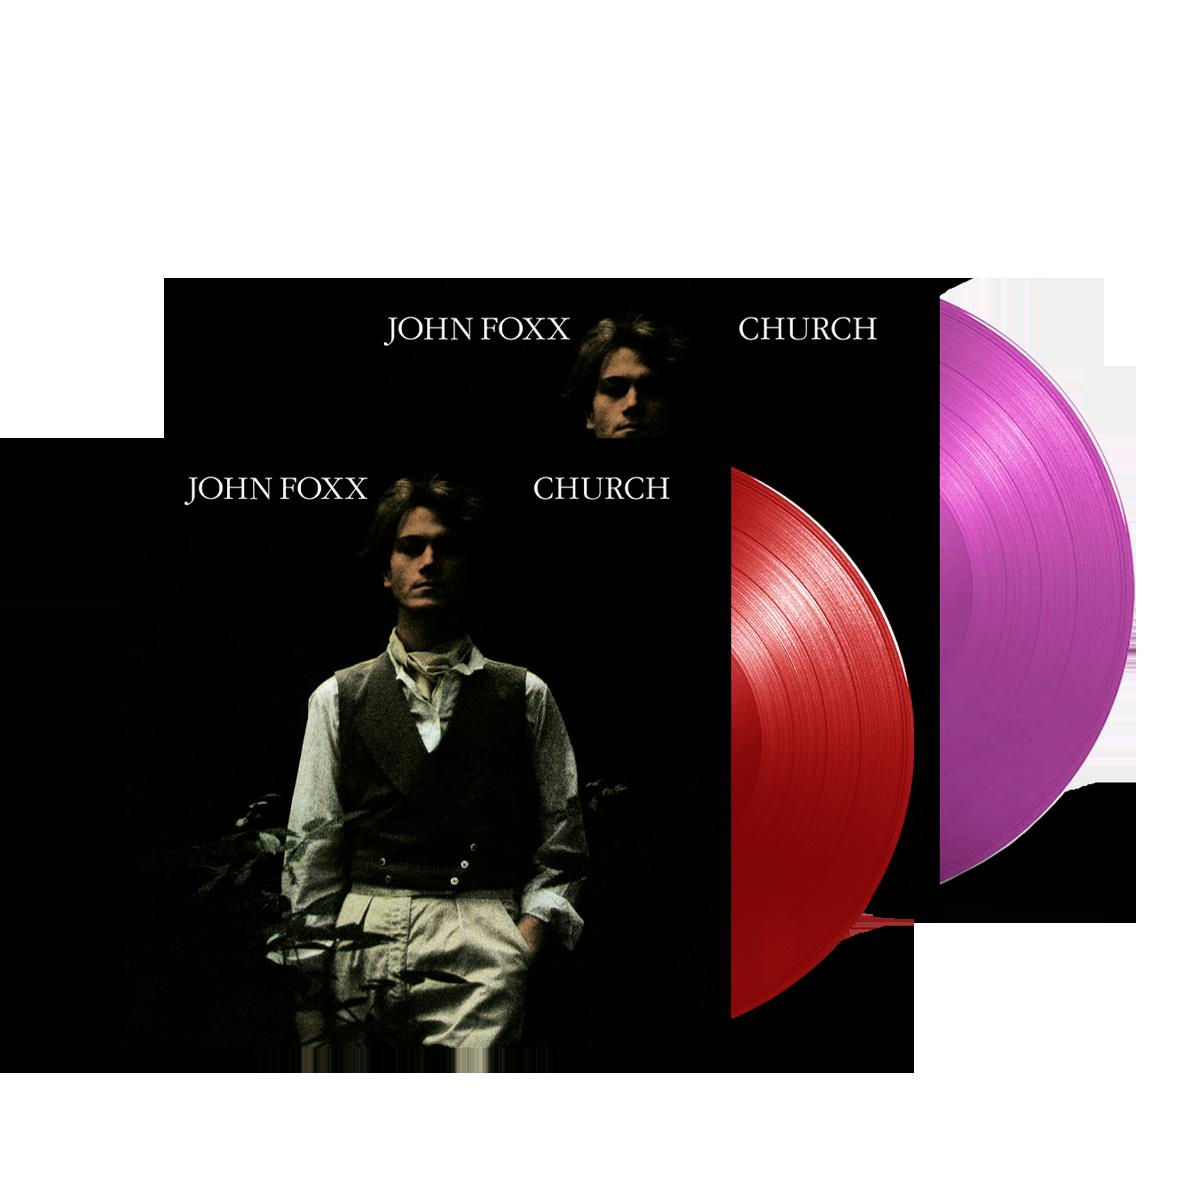 Buy Online John Foxx - Church Ltd Edition Transparent Red Vinyl + Neon Violet Vinyl